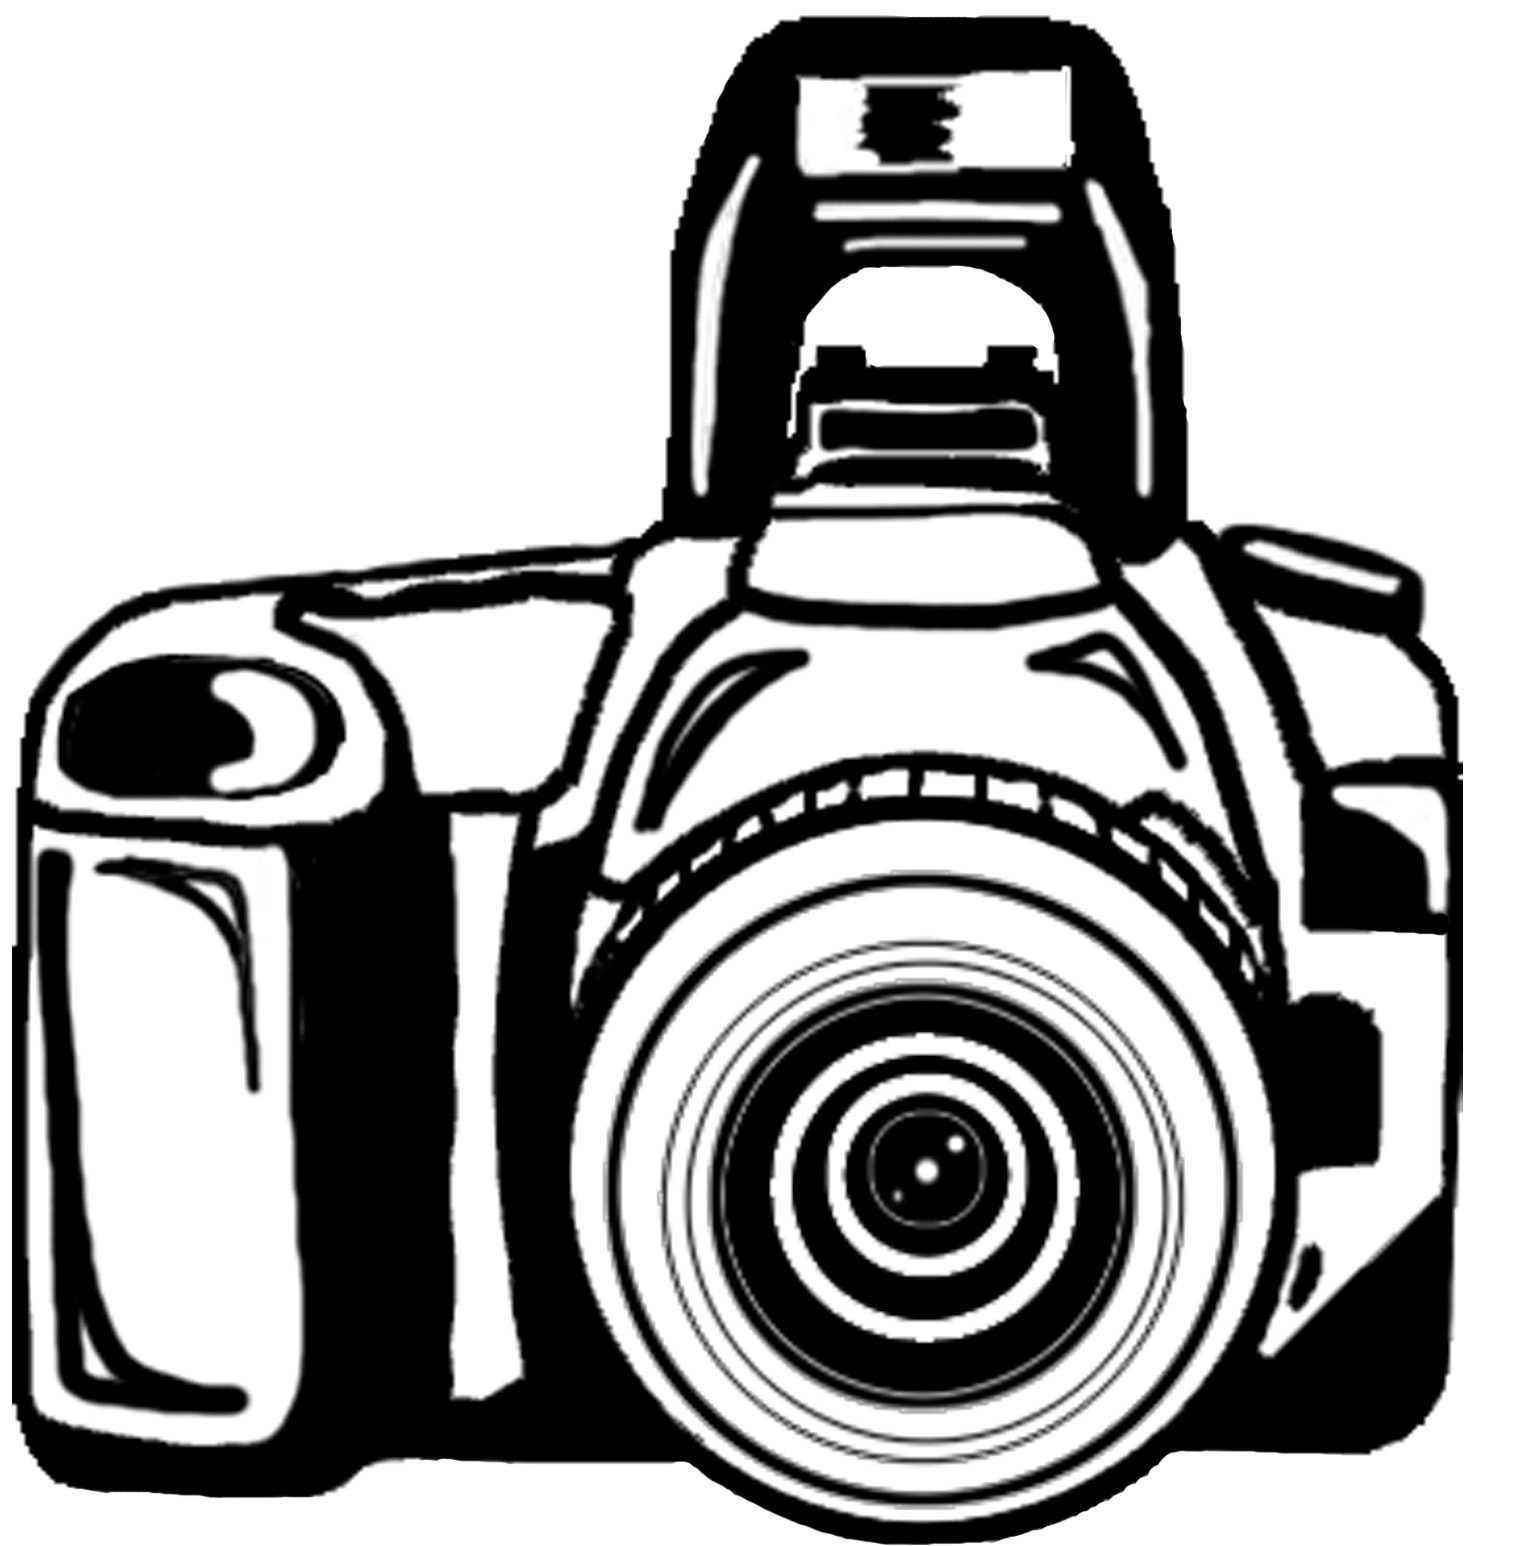 1529x1546 Coolest Vintage Camera Clip Art Black And White 99 Ideas